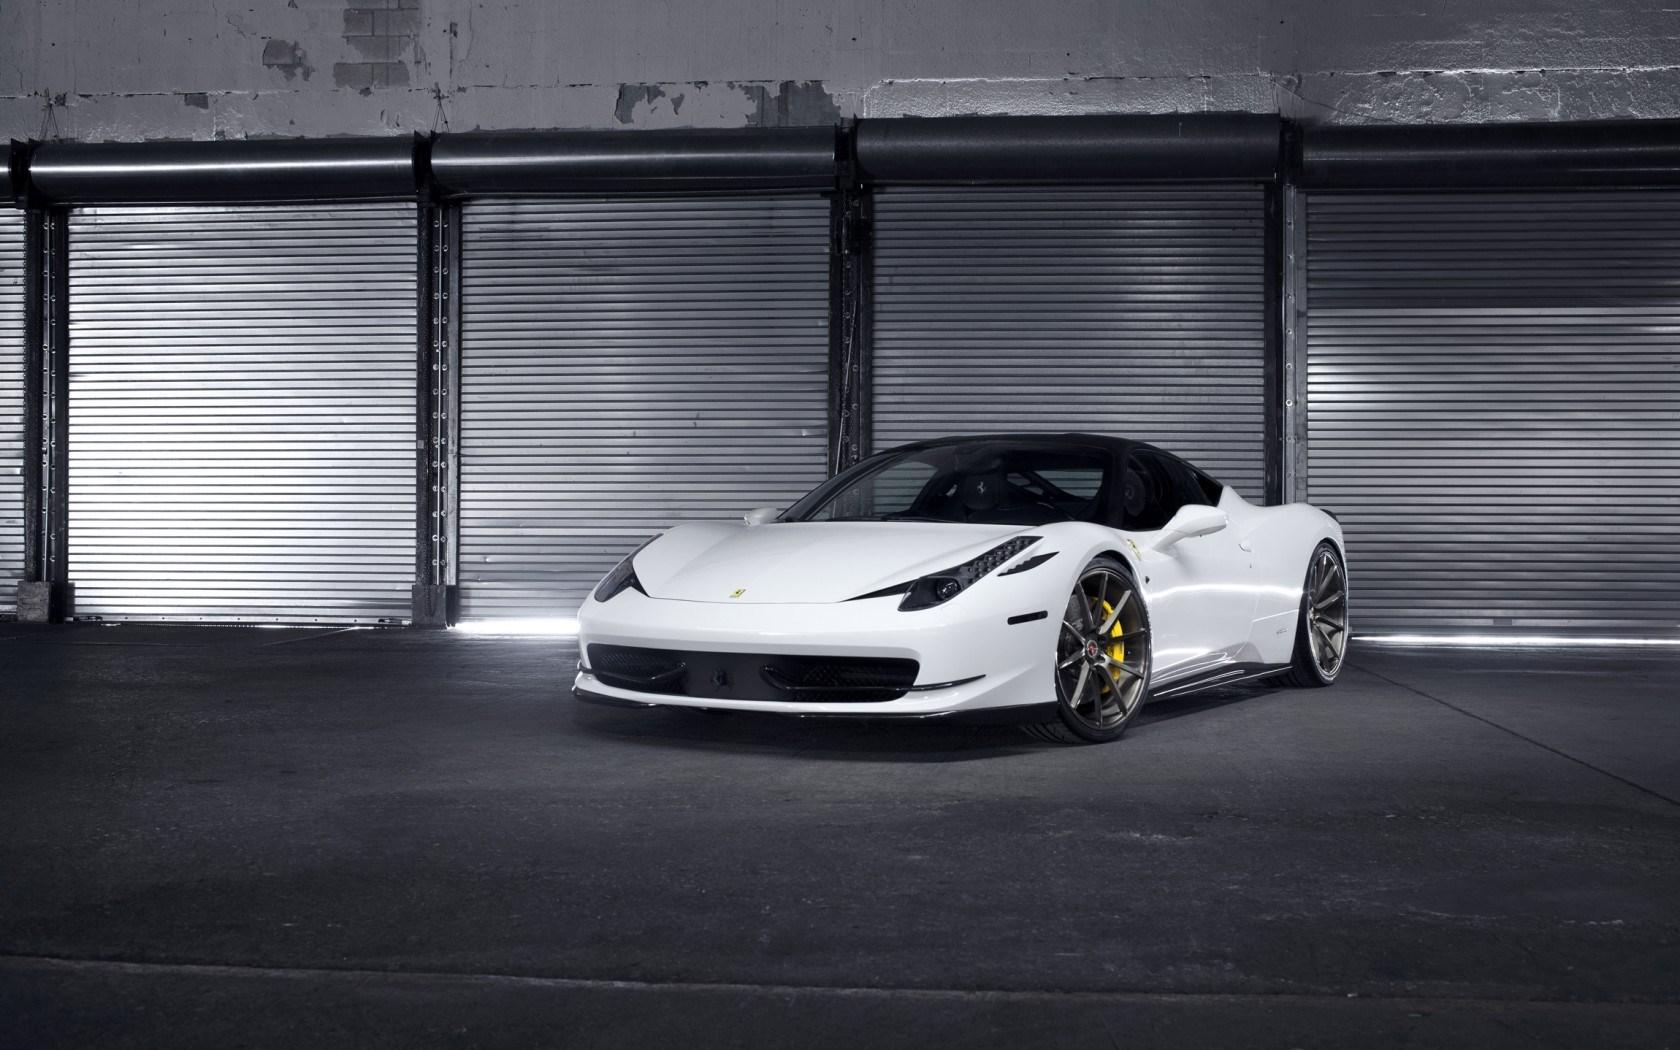 Ferrari 458 wallpaper 38 1680x1050 voltagebd Gallery